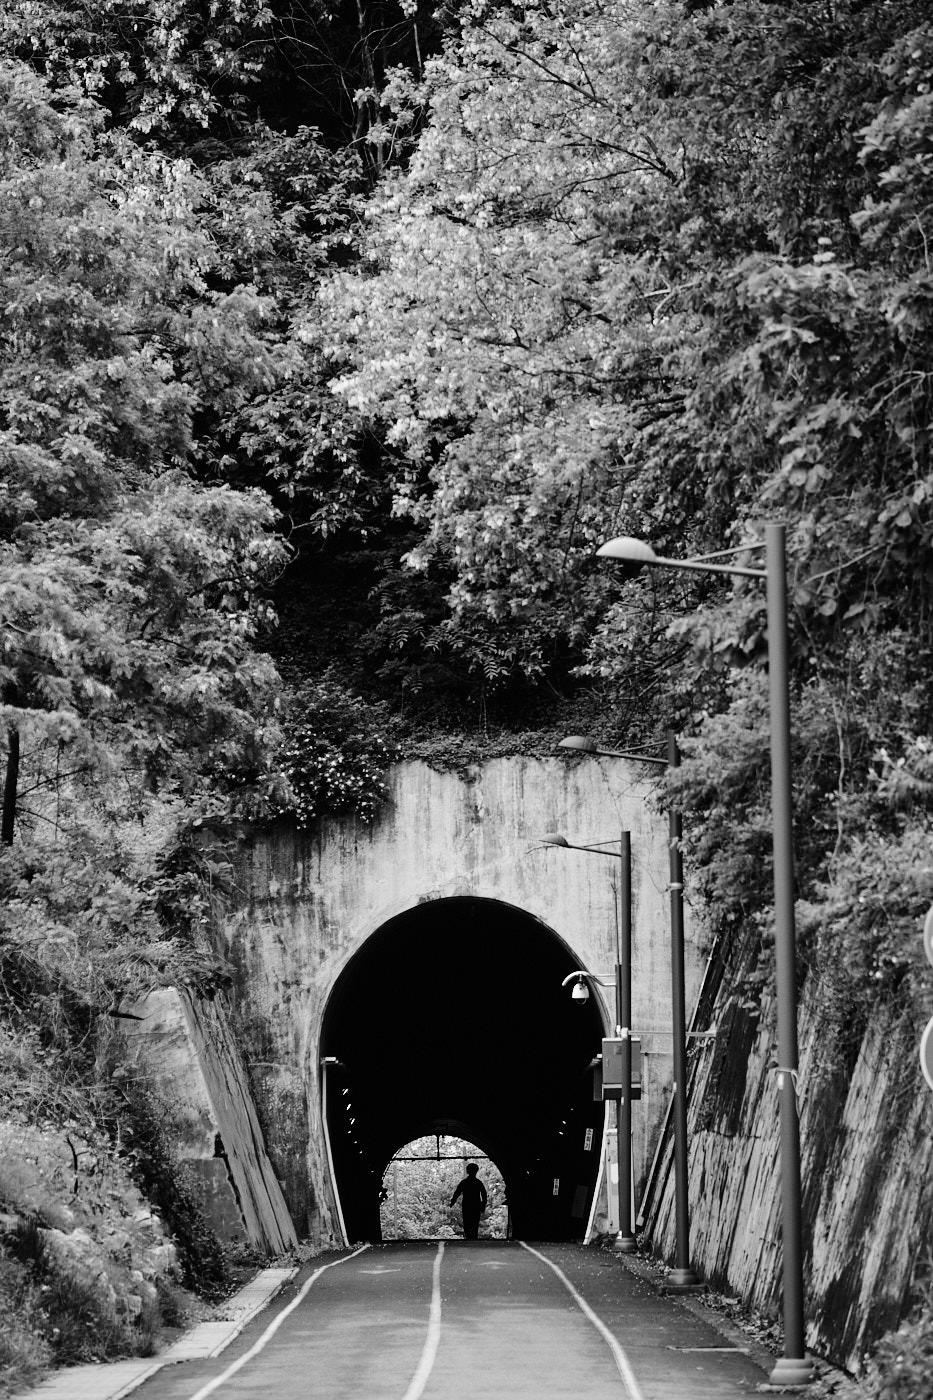 Tunnel - Korea Cycling Paths